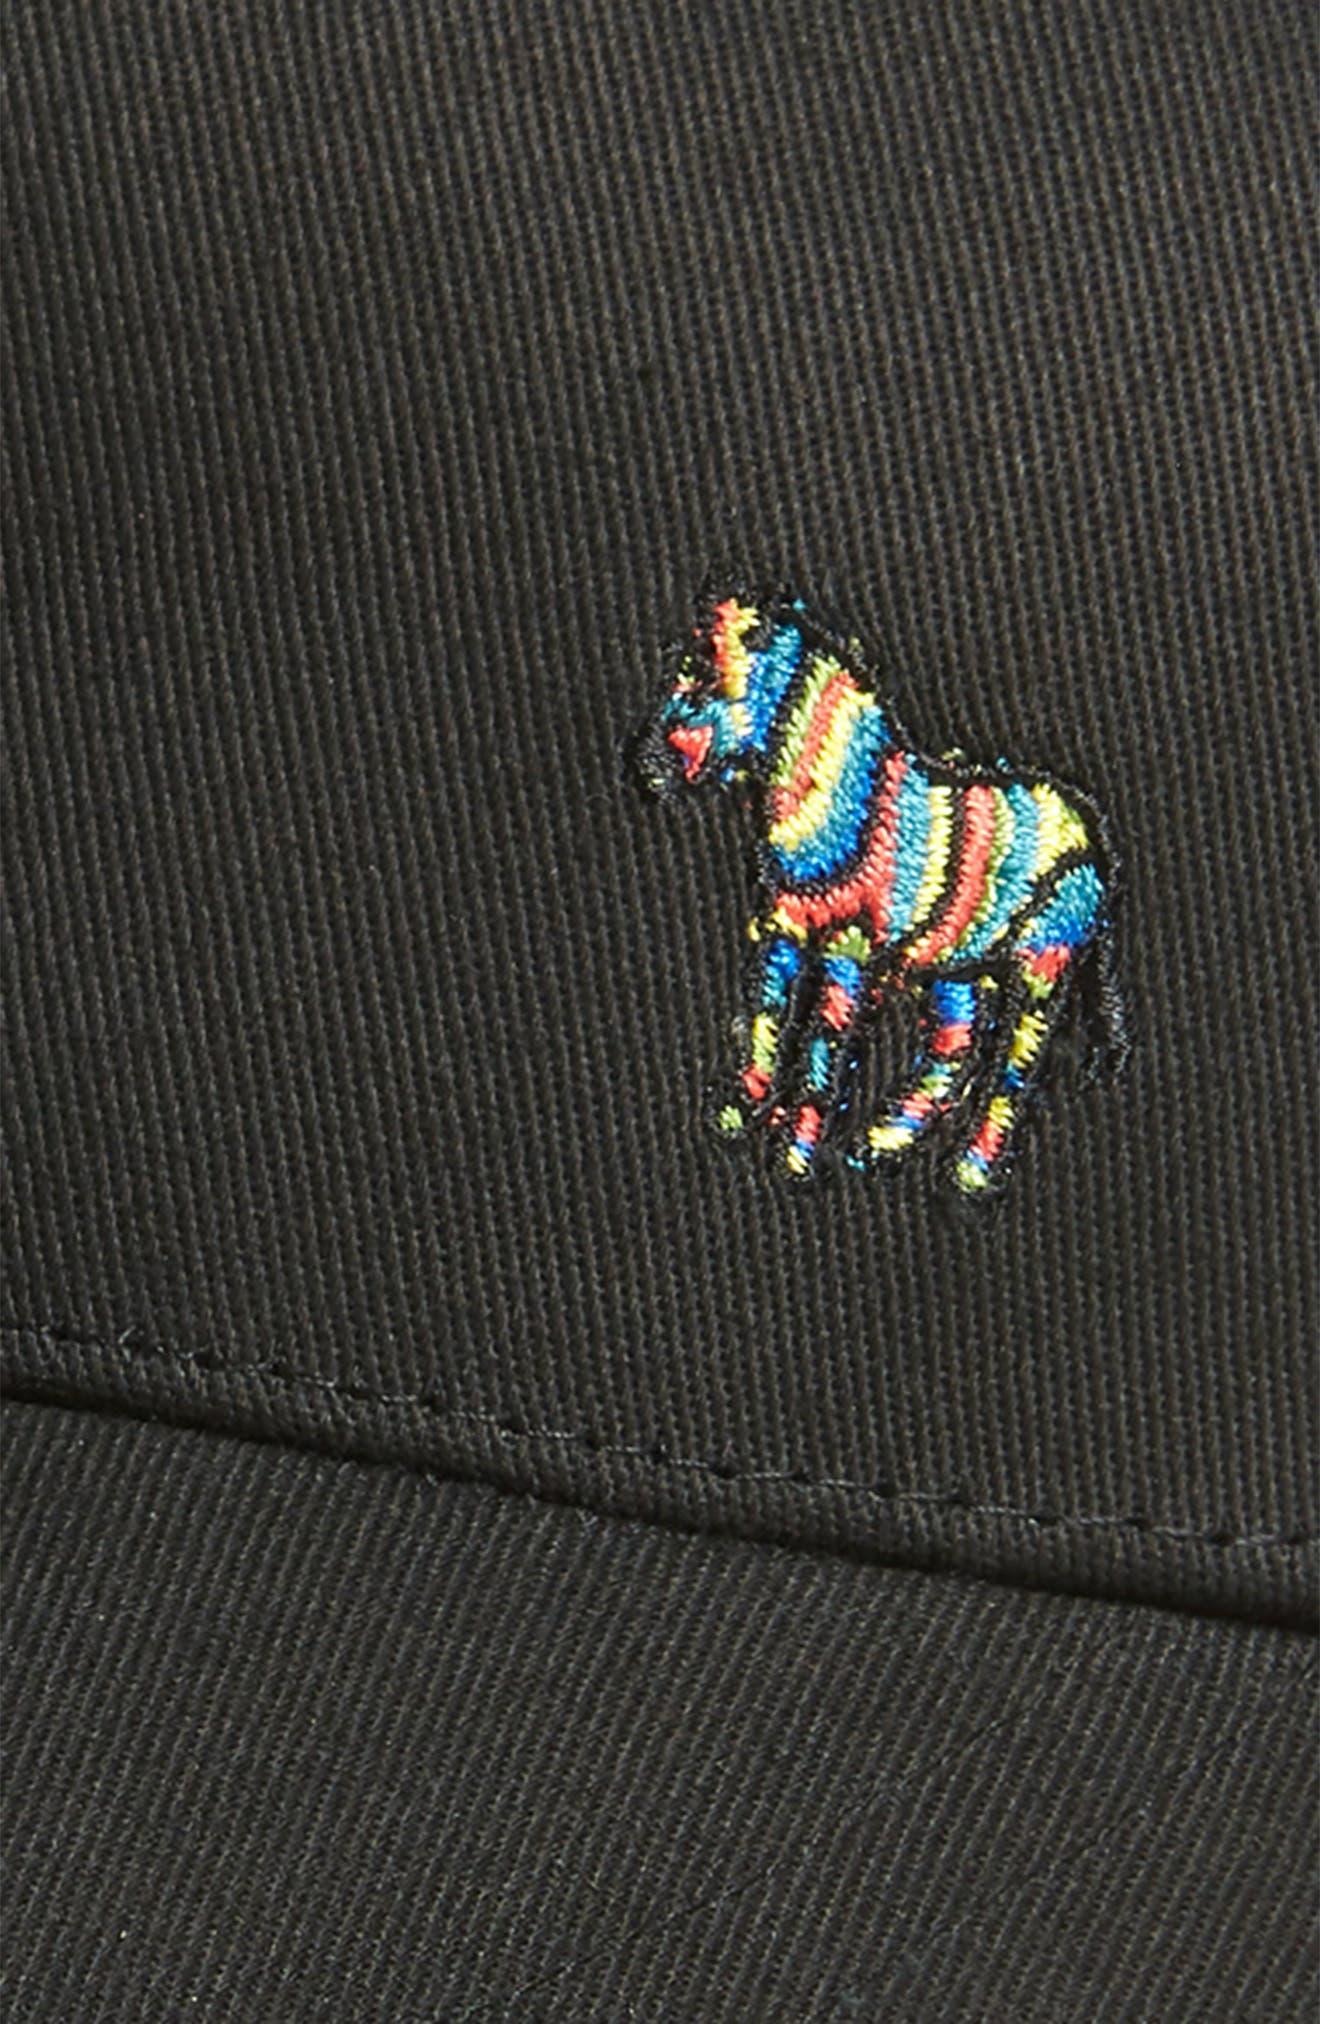 Zebra Logo Ball Cap,                             Alternate thumbnail 3, color,                             001